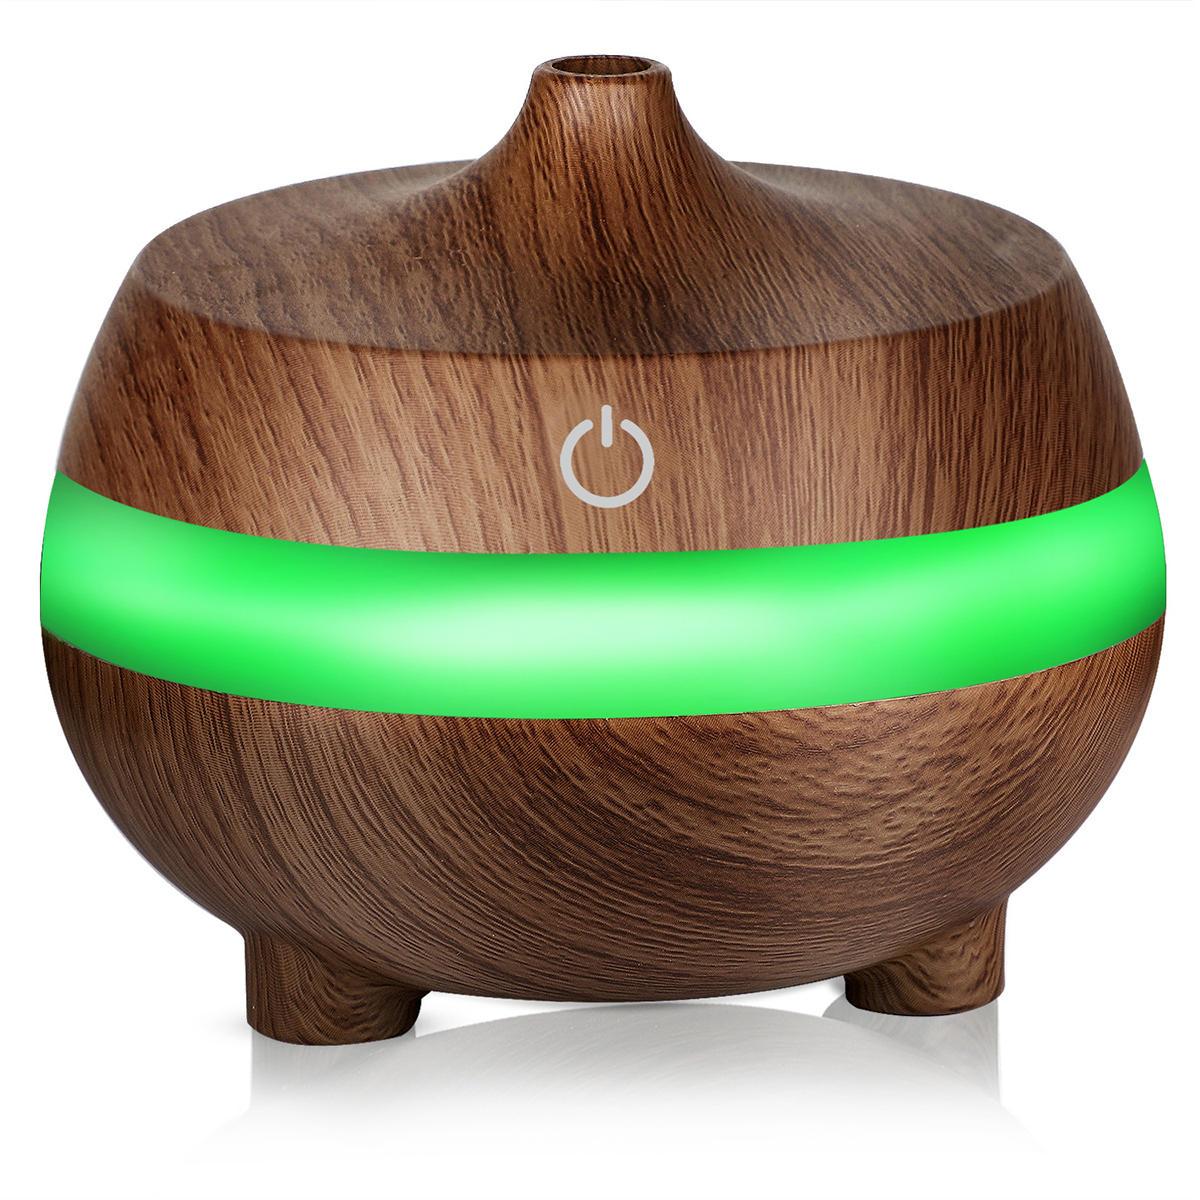 300 ml Minyak Esensial Diffuser Air Humidifier dengan 7 Warna Lampu USB Diffuser Aromaterapi dengan Auto Shut-off Fungsi Keren Mist ...